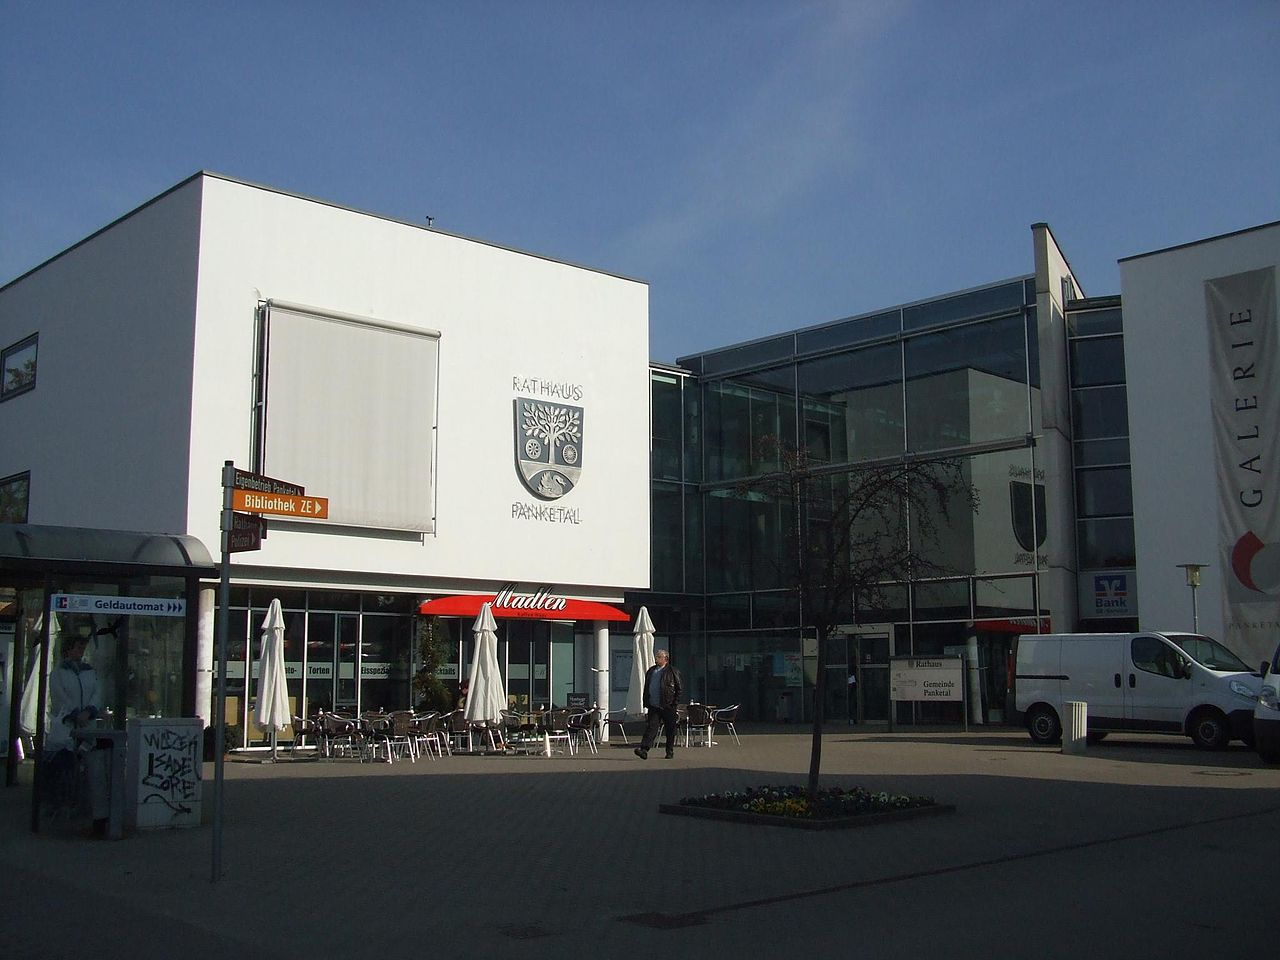 Rathaus Panketal 2010.jpg